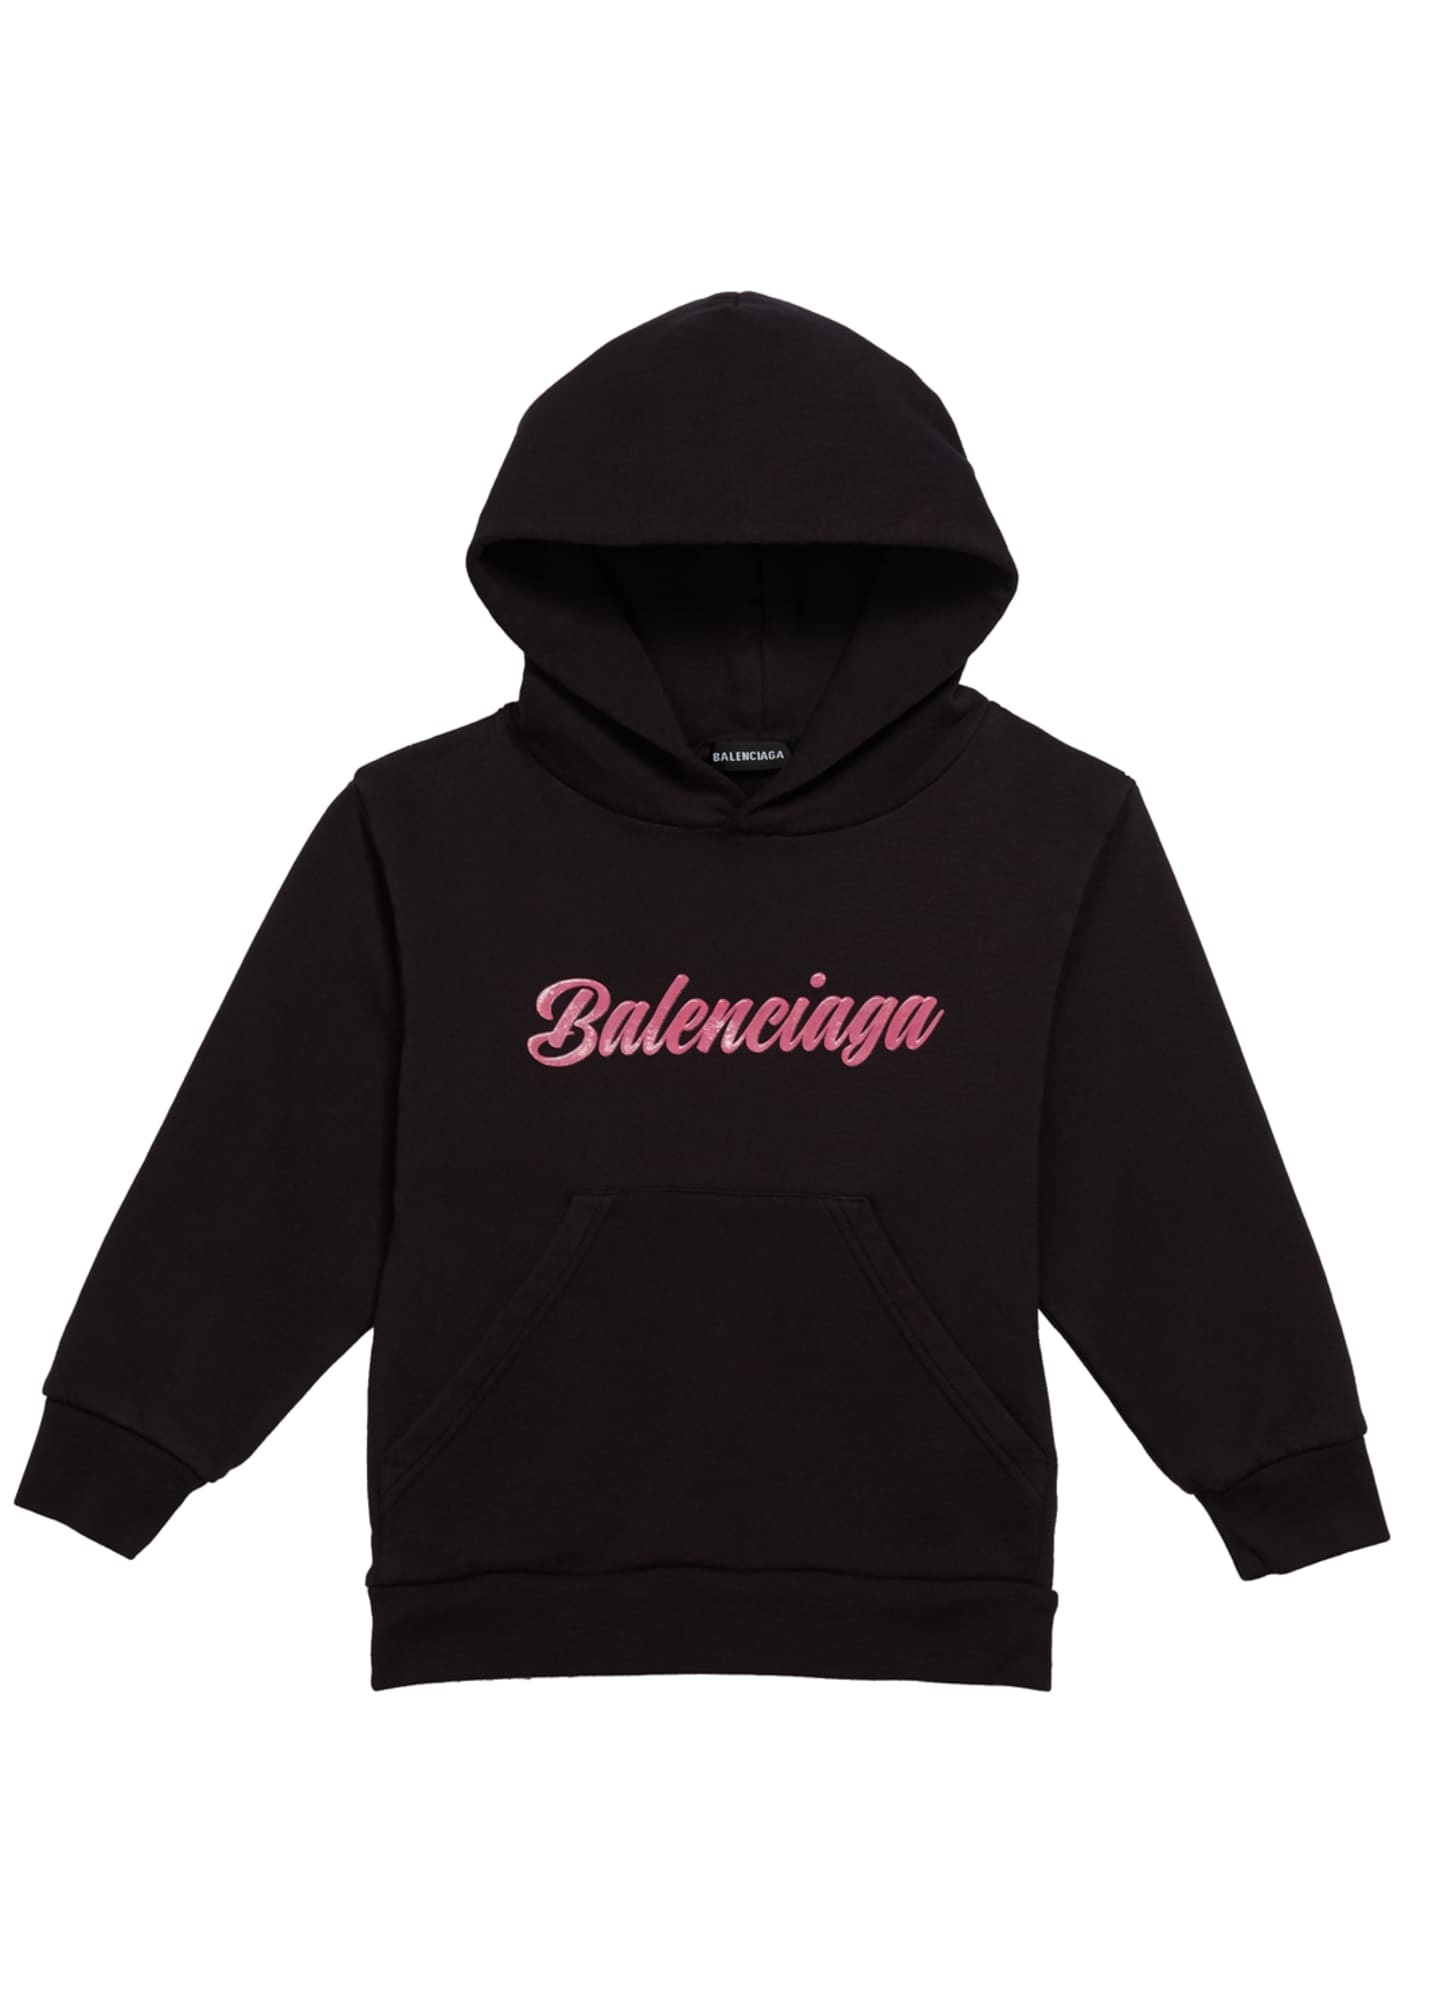 Balenciaga Kid's Classic Opulence Logo Hoodie, Size 2-10